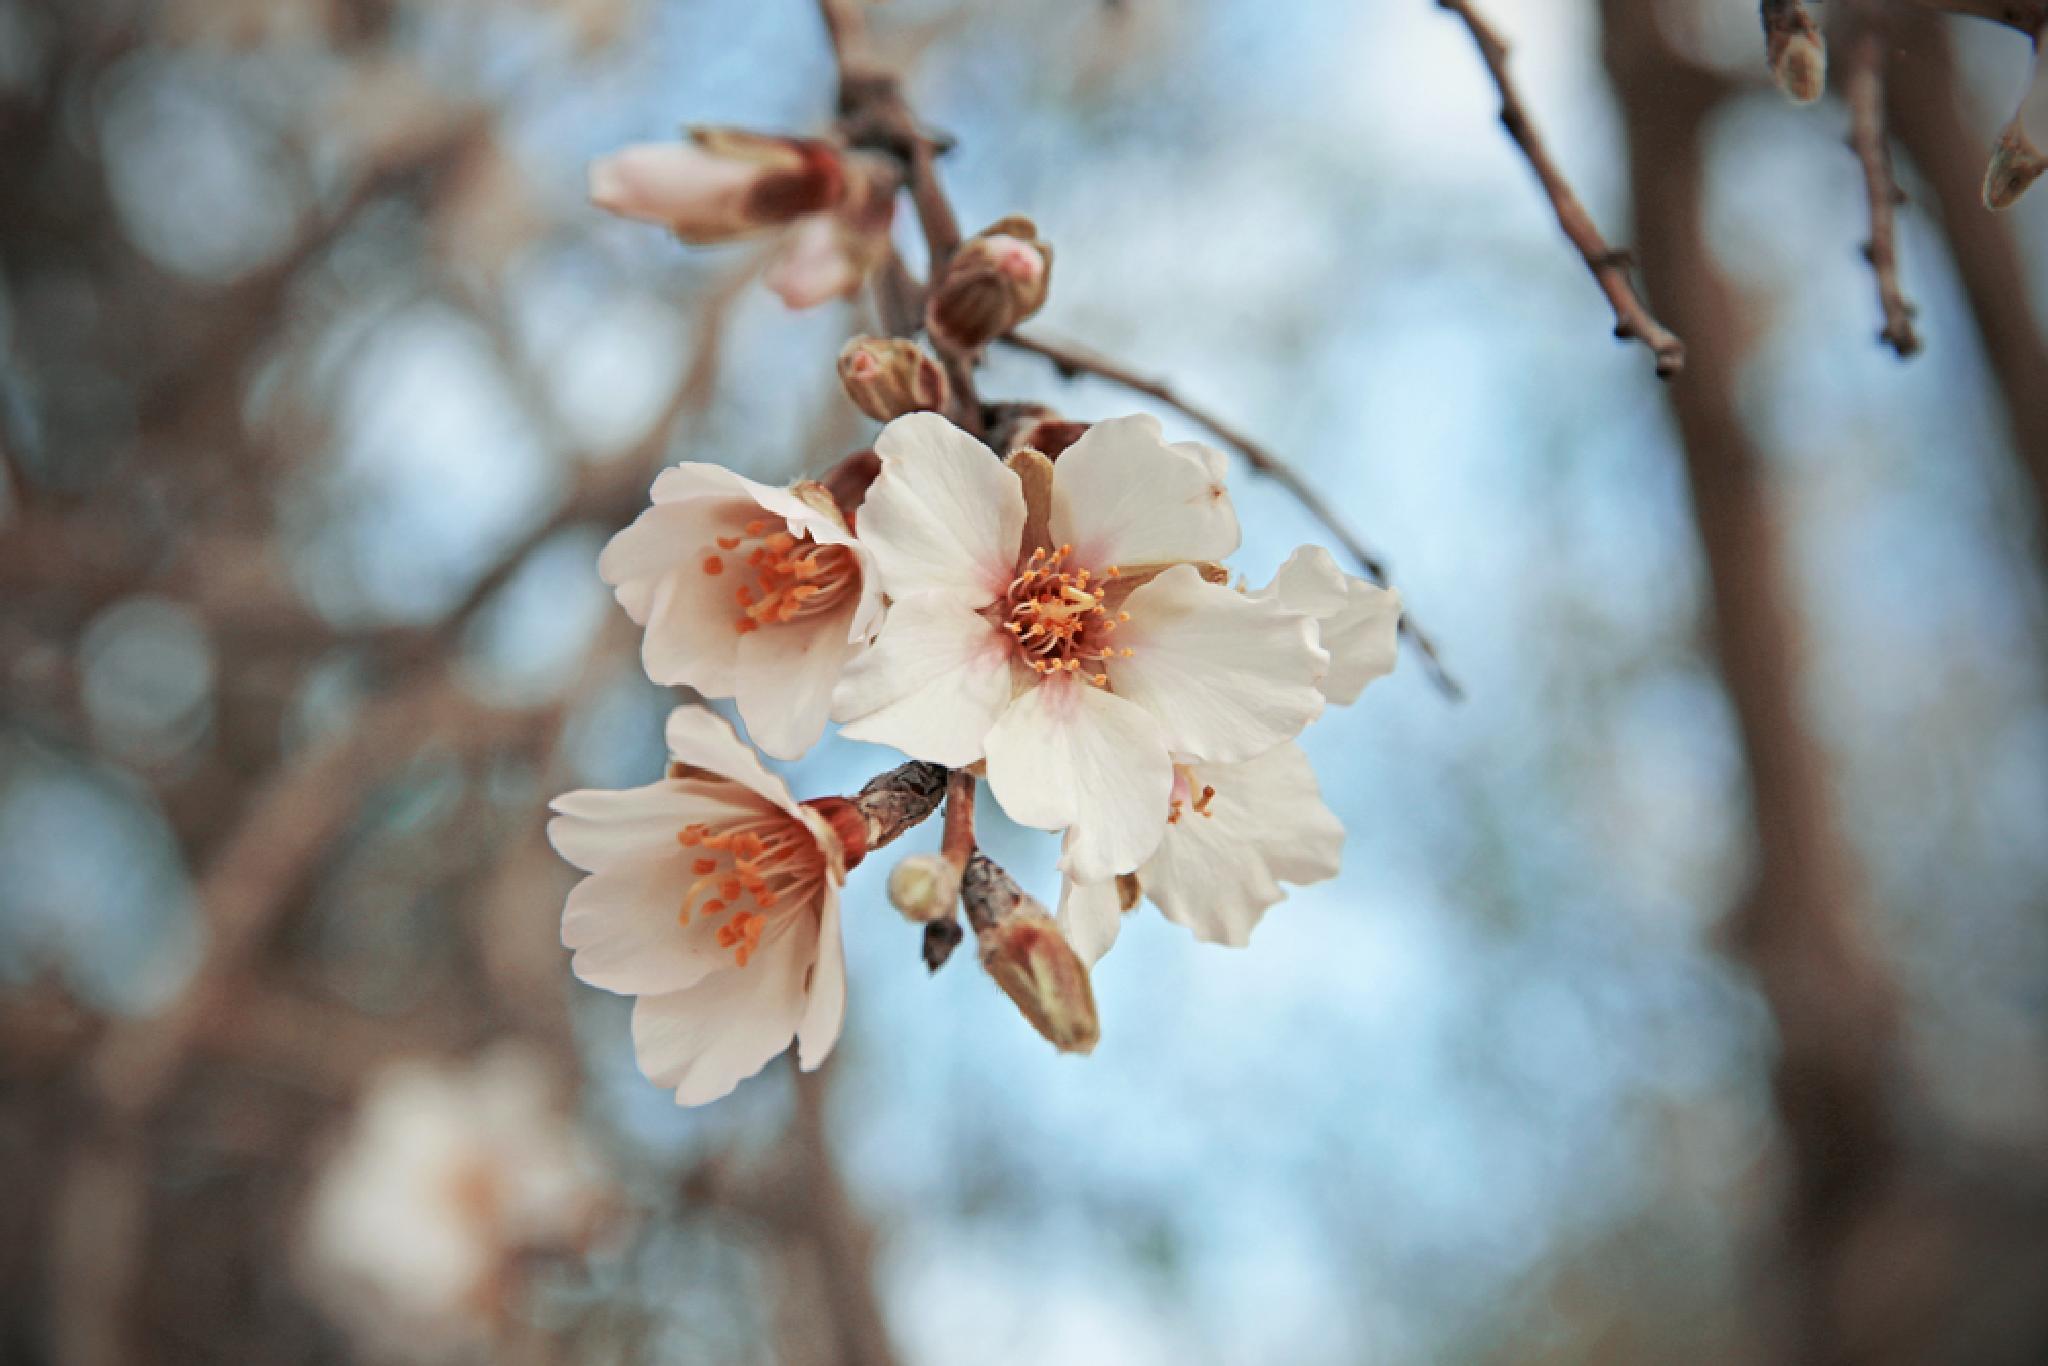 Prunus by Ralph Grech